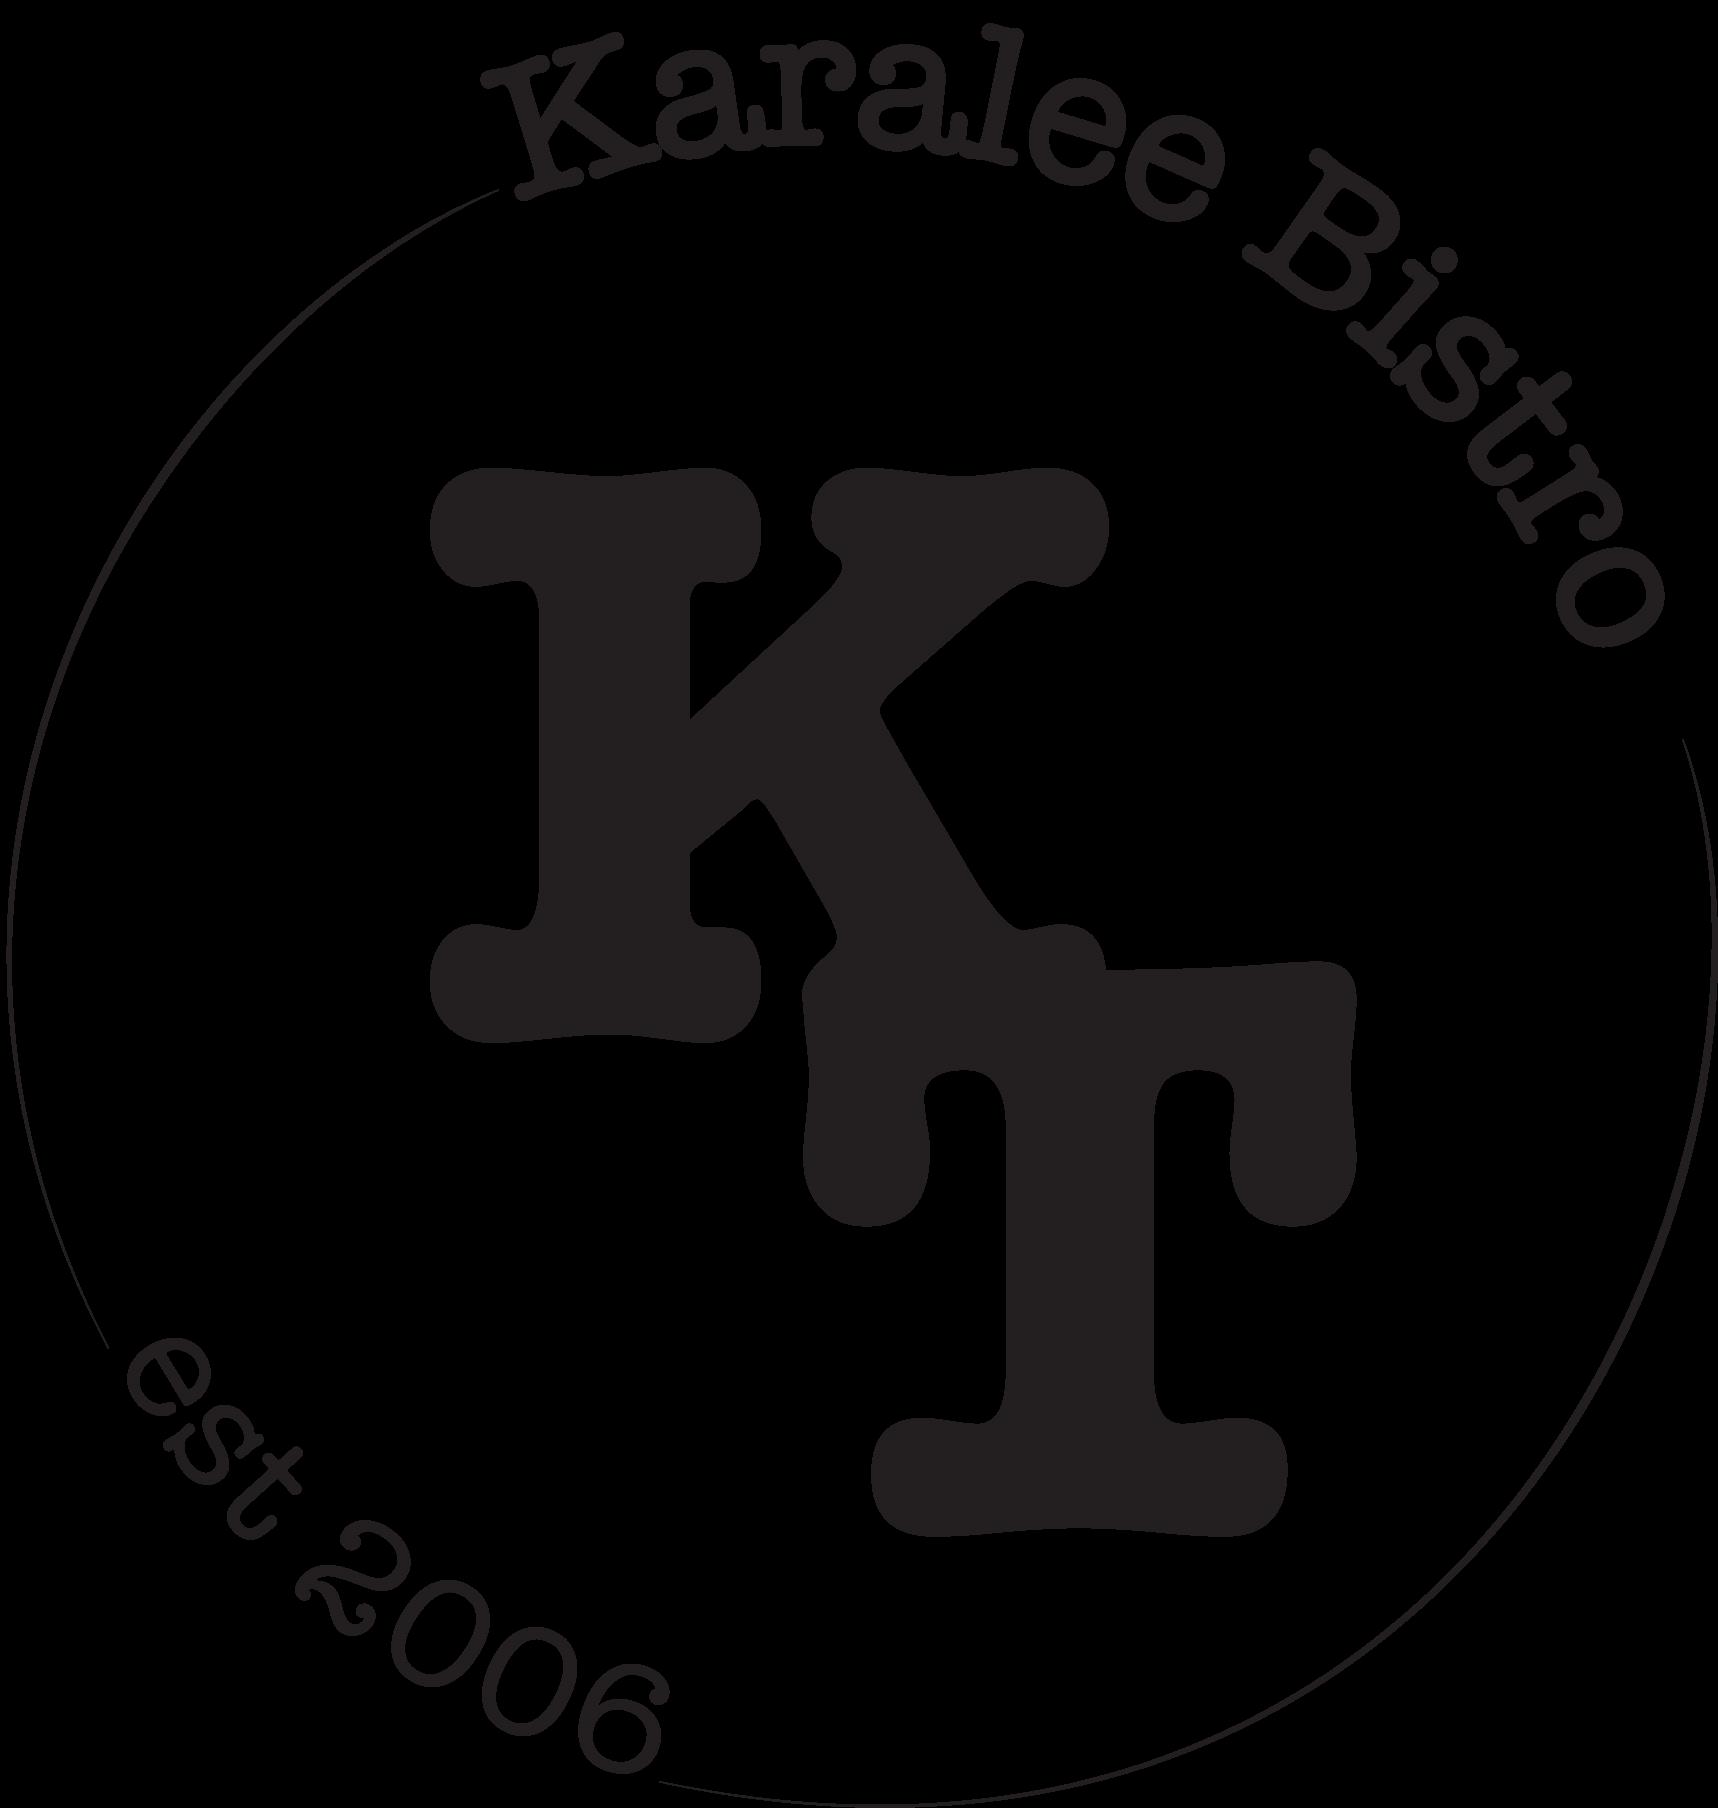 Karalee Bistro LOGO (1)